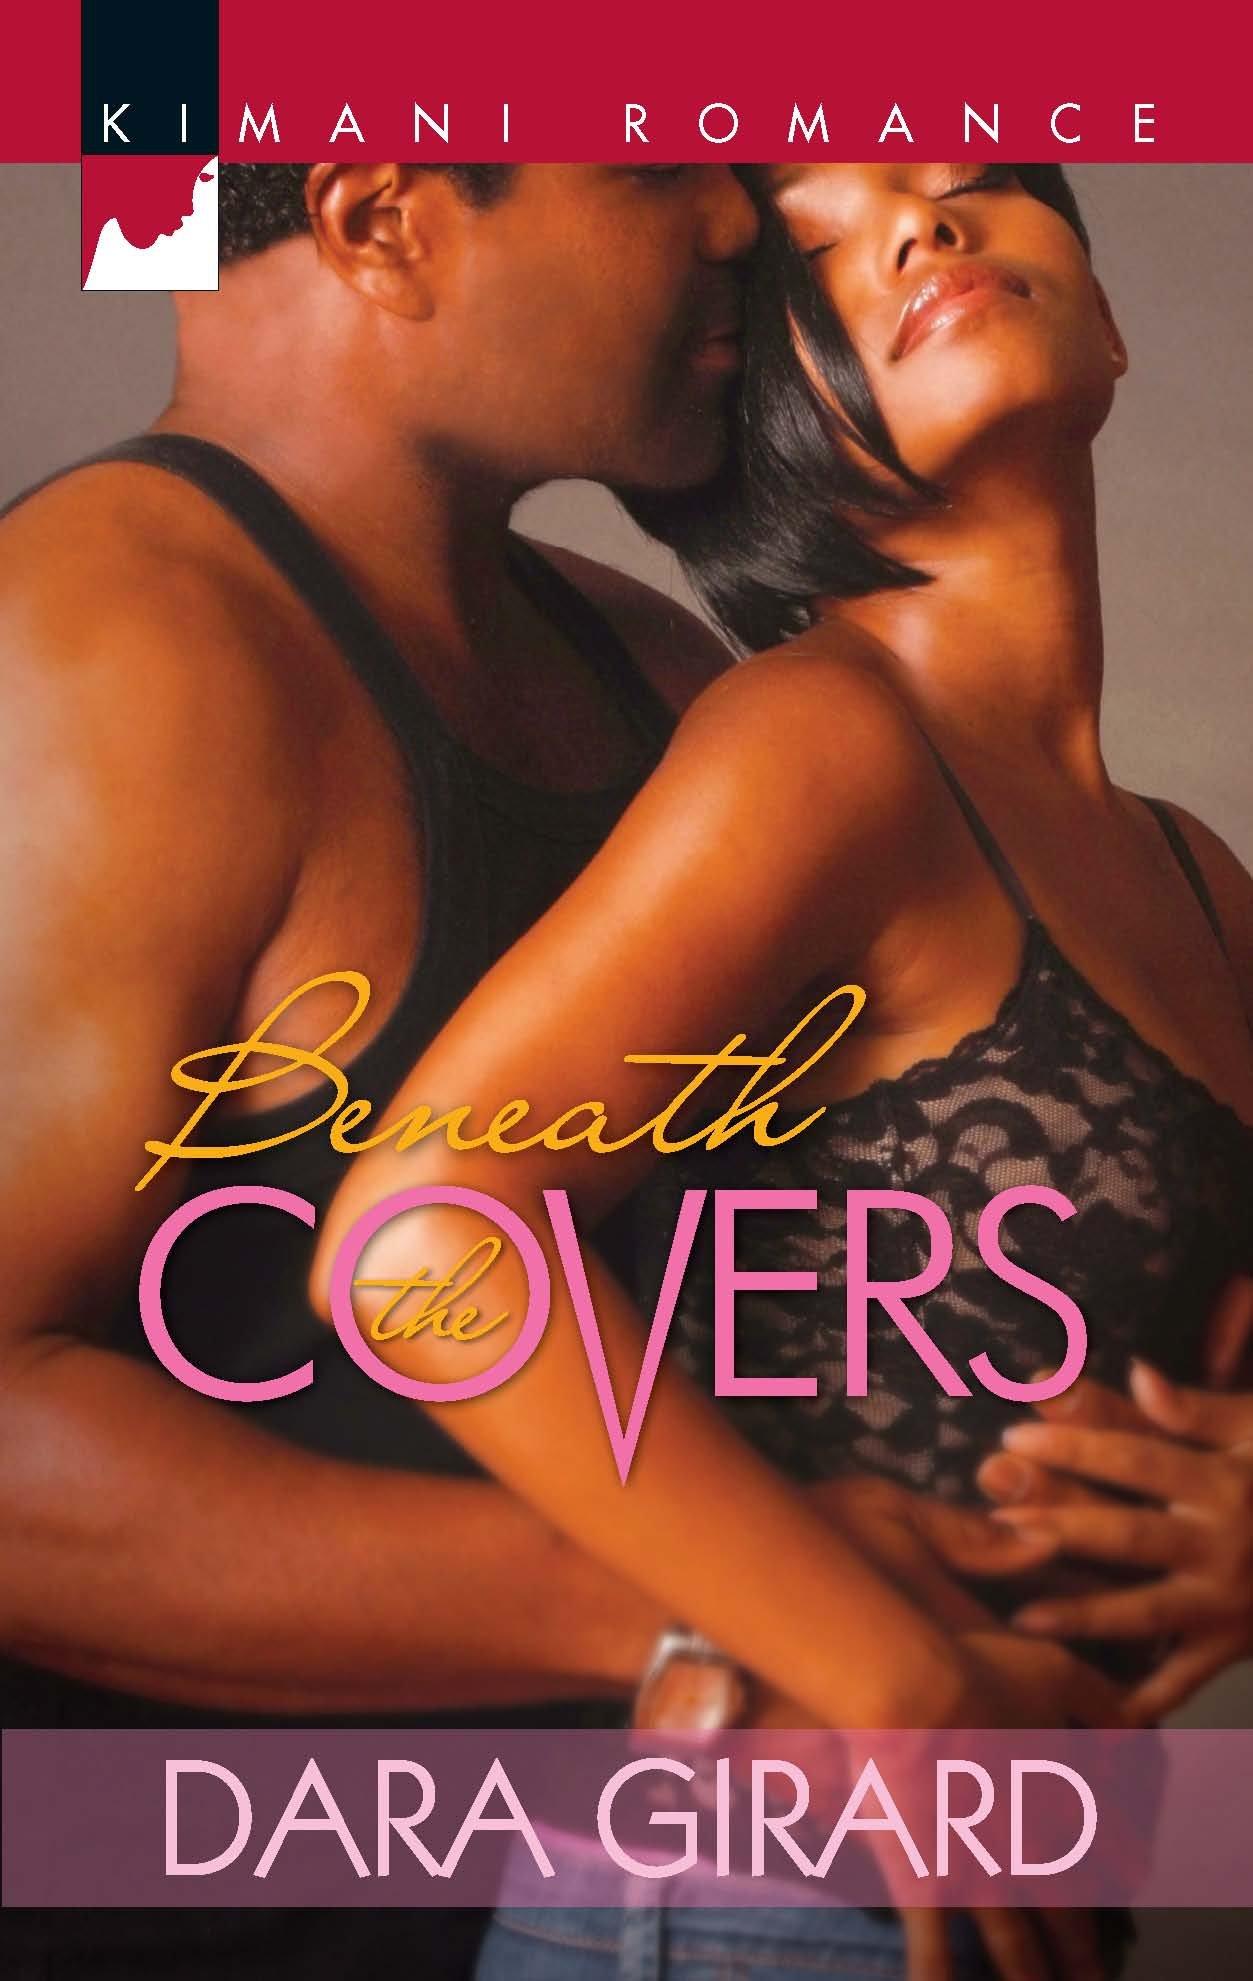 Amazon.com: Beneath the Covers (Kimani Romance) (9780373862078): Dara  Girard: Books